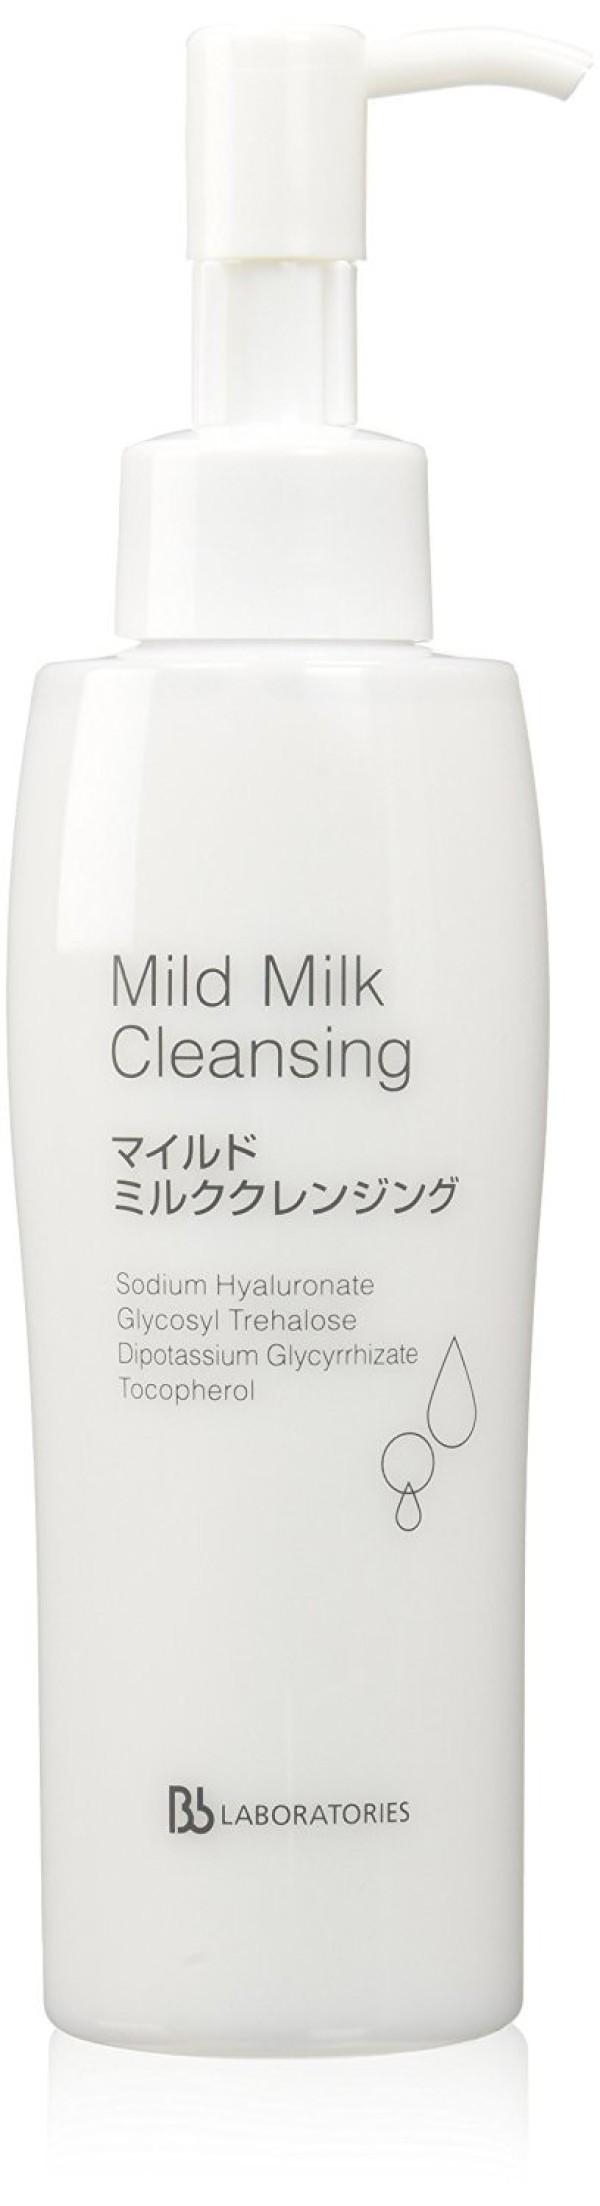 Молочко для снятия макияжа Mild Milk Cleansing BB Laboratoires